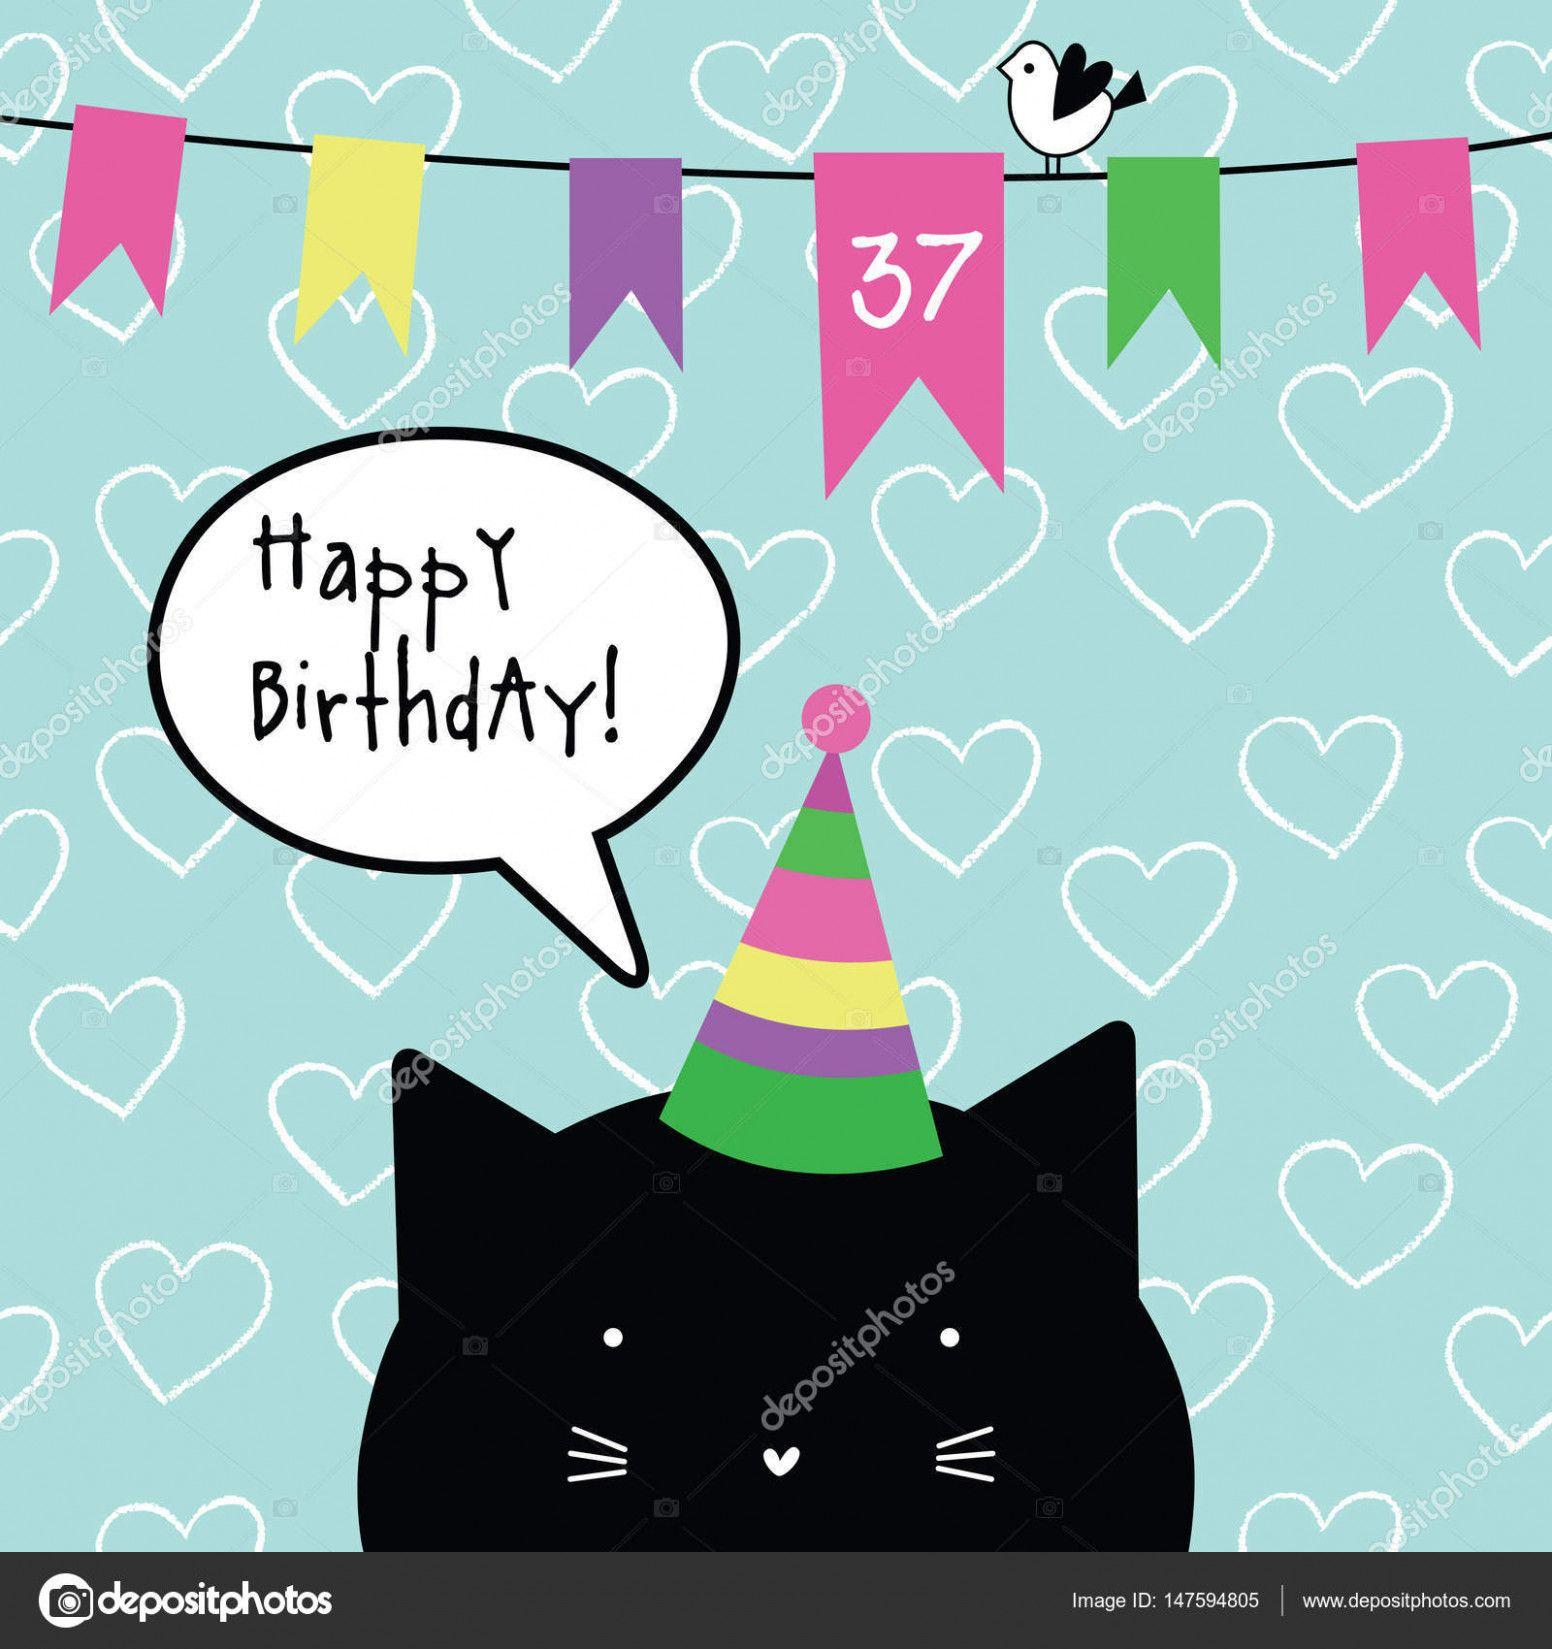 20 Creative Happy Birthday Image Card